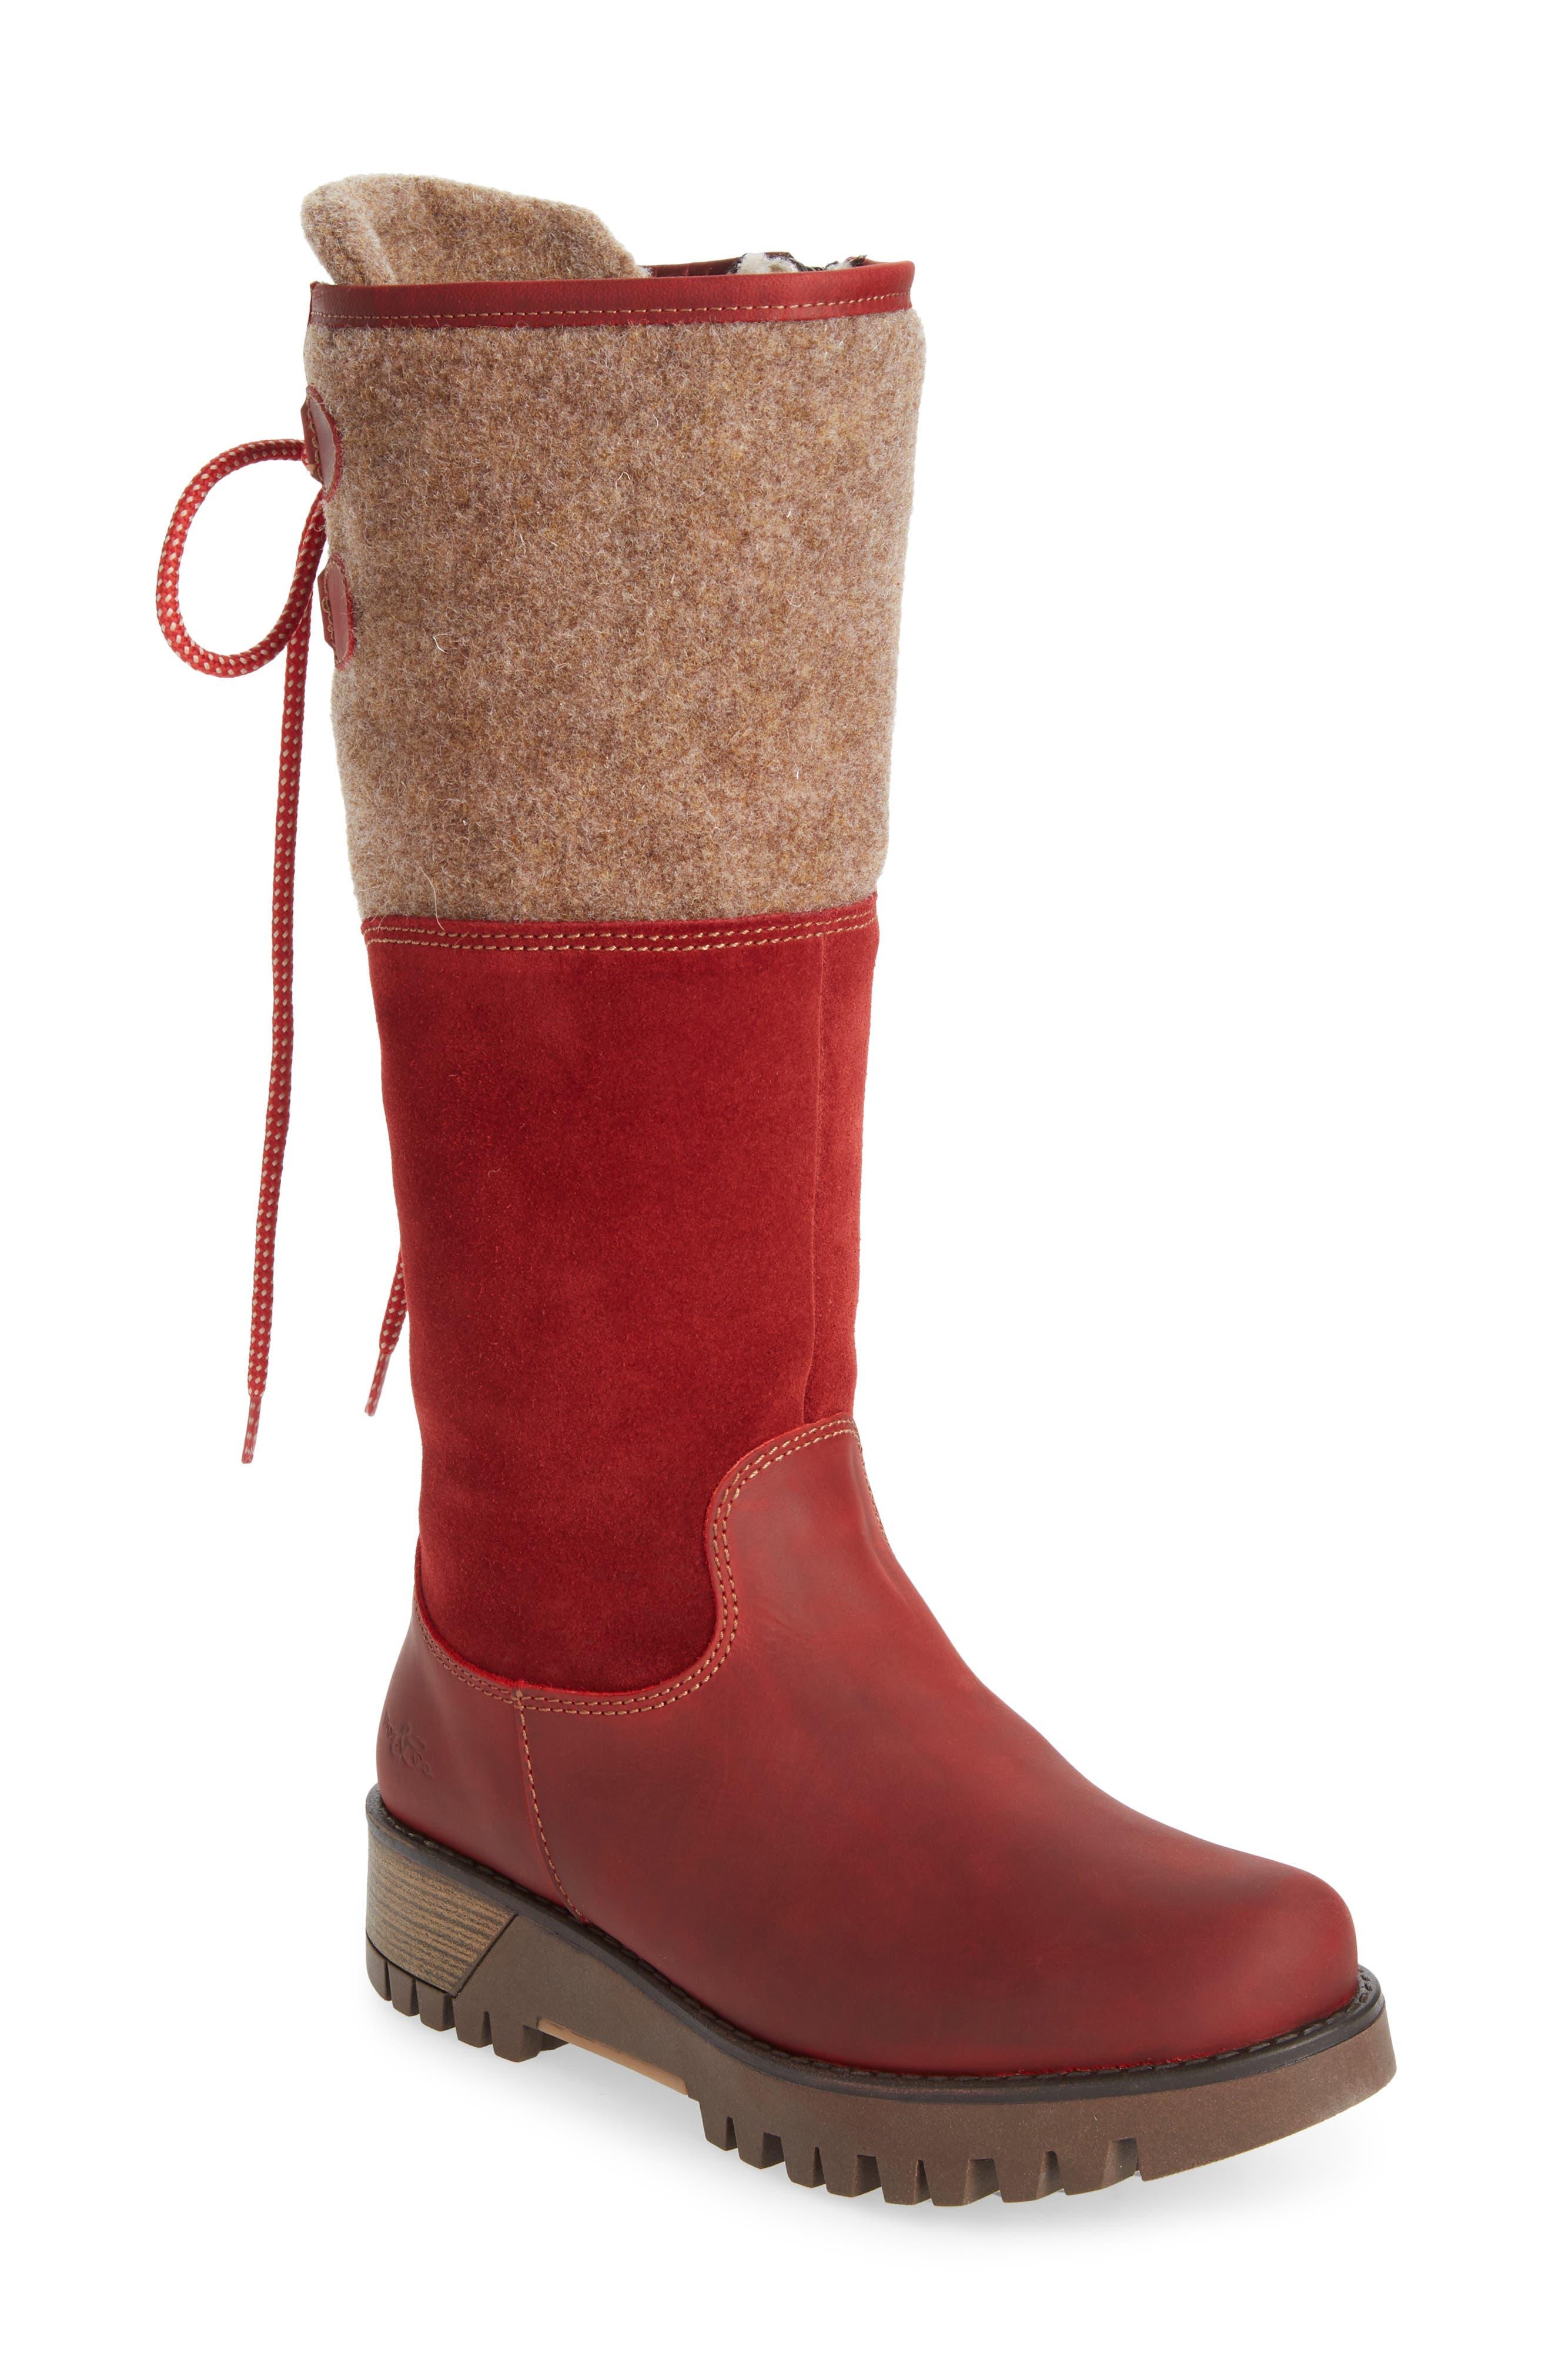 BOS. & CO., 'Ginger' Waterproof Mid Calf Platform Boot, Main thumbnail 1, color, RED/ SCARLET WOOL